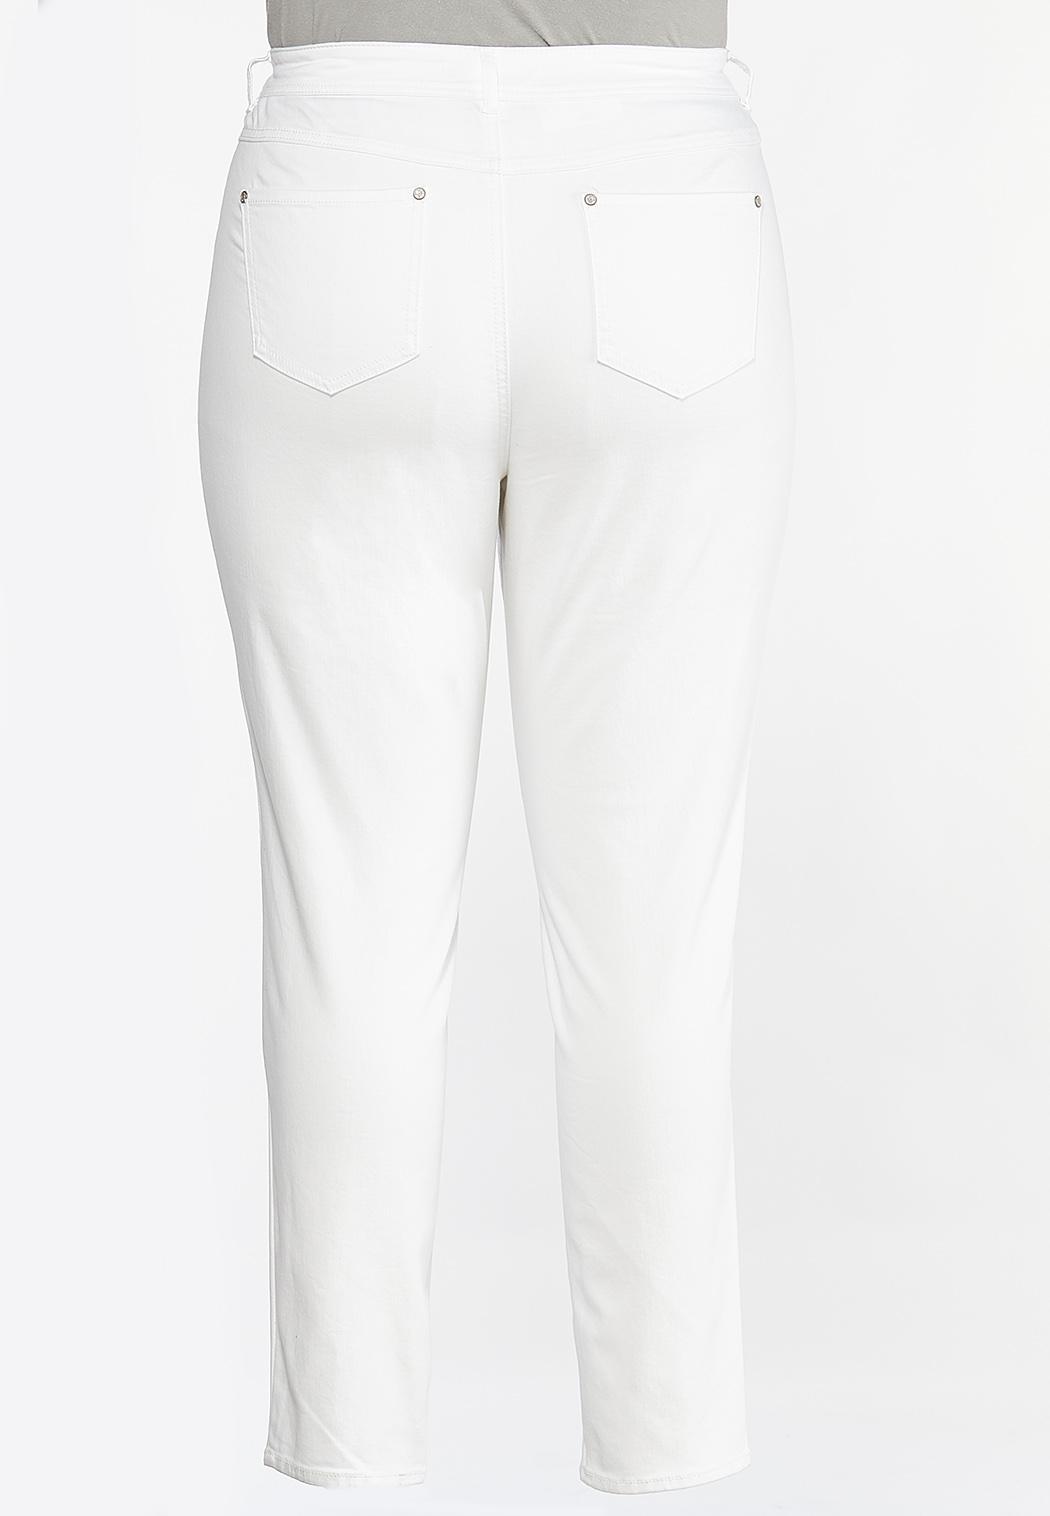 Plus Size White Skinny Jeans (Item #44438031)